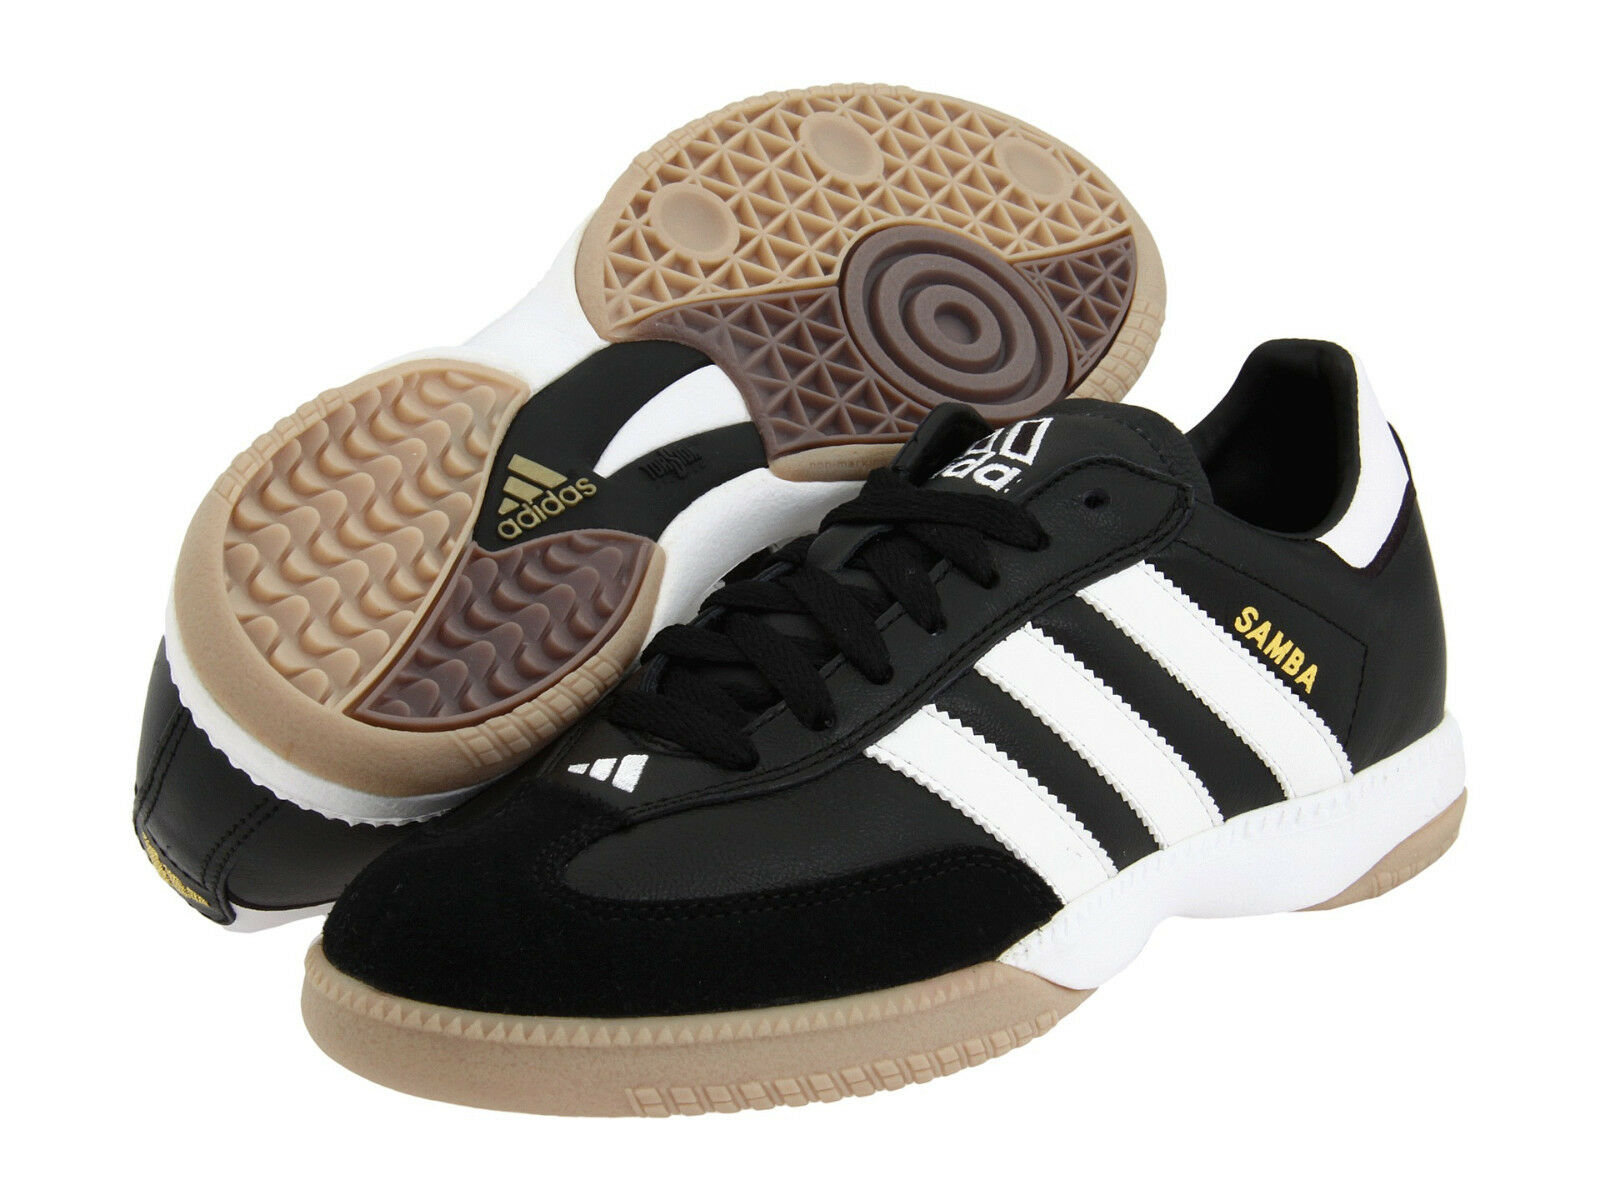 Men's Adidas Samba Millennium IN Black Sport Indoor Soccer Shoes 088559 9-13.5